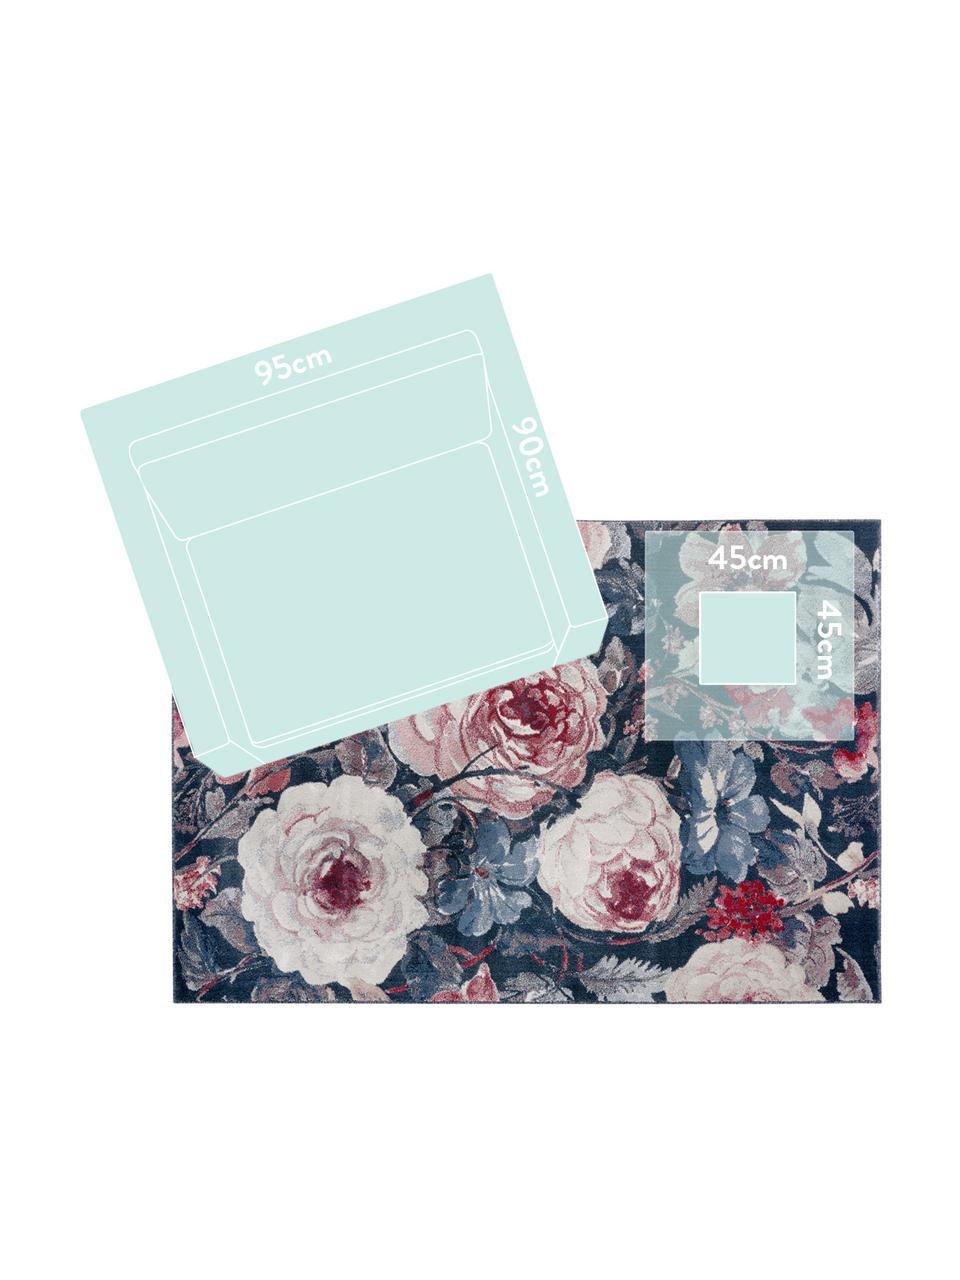 Teppich Peony mit Blumenmuster, 100% Polypropylen, Blau, Cremefarben, Rot, B 200 x L 290 cm (Größe L)